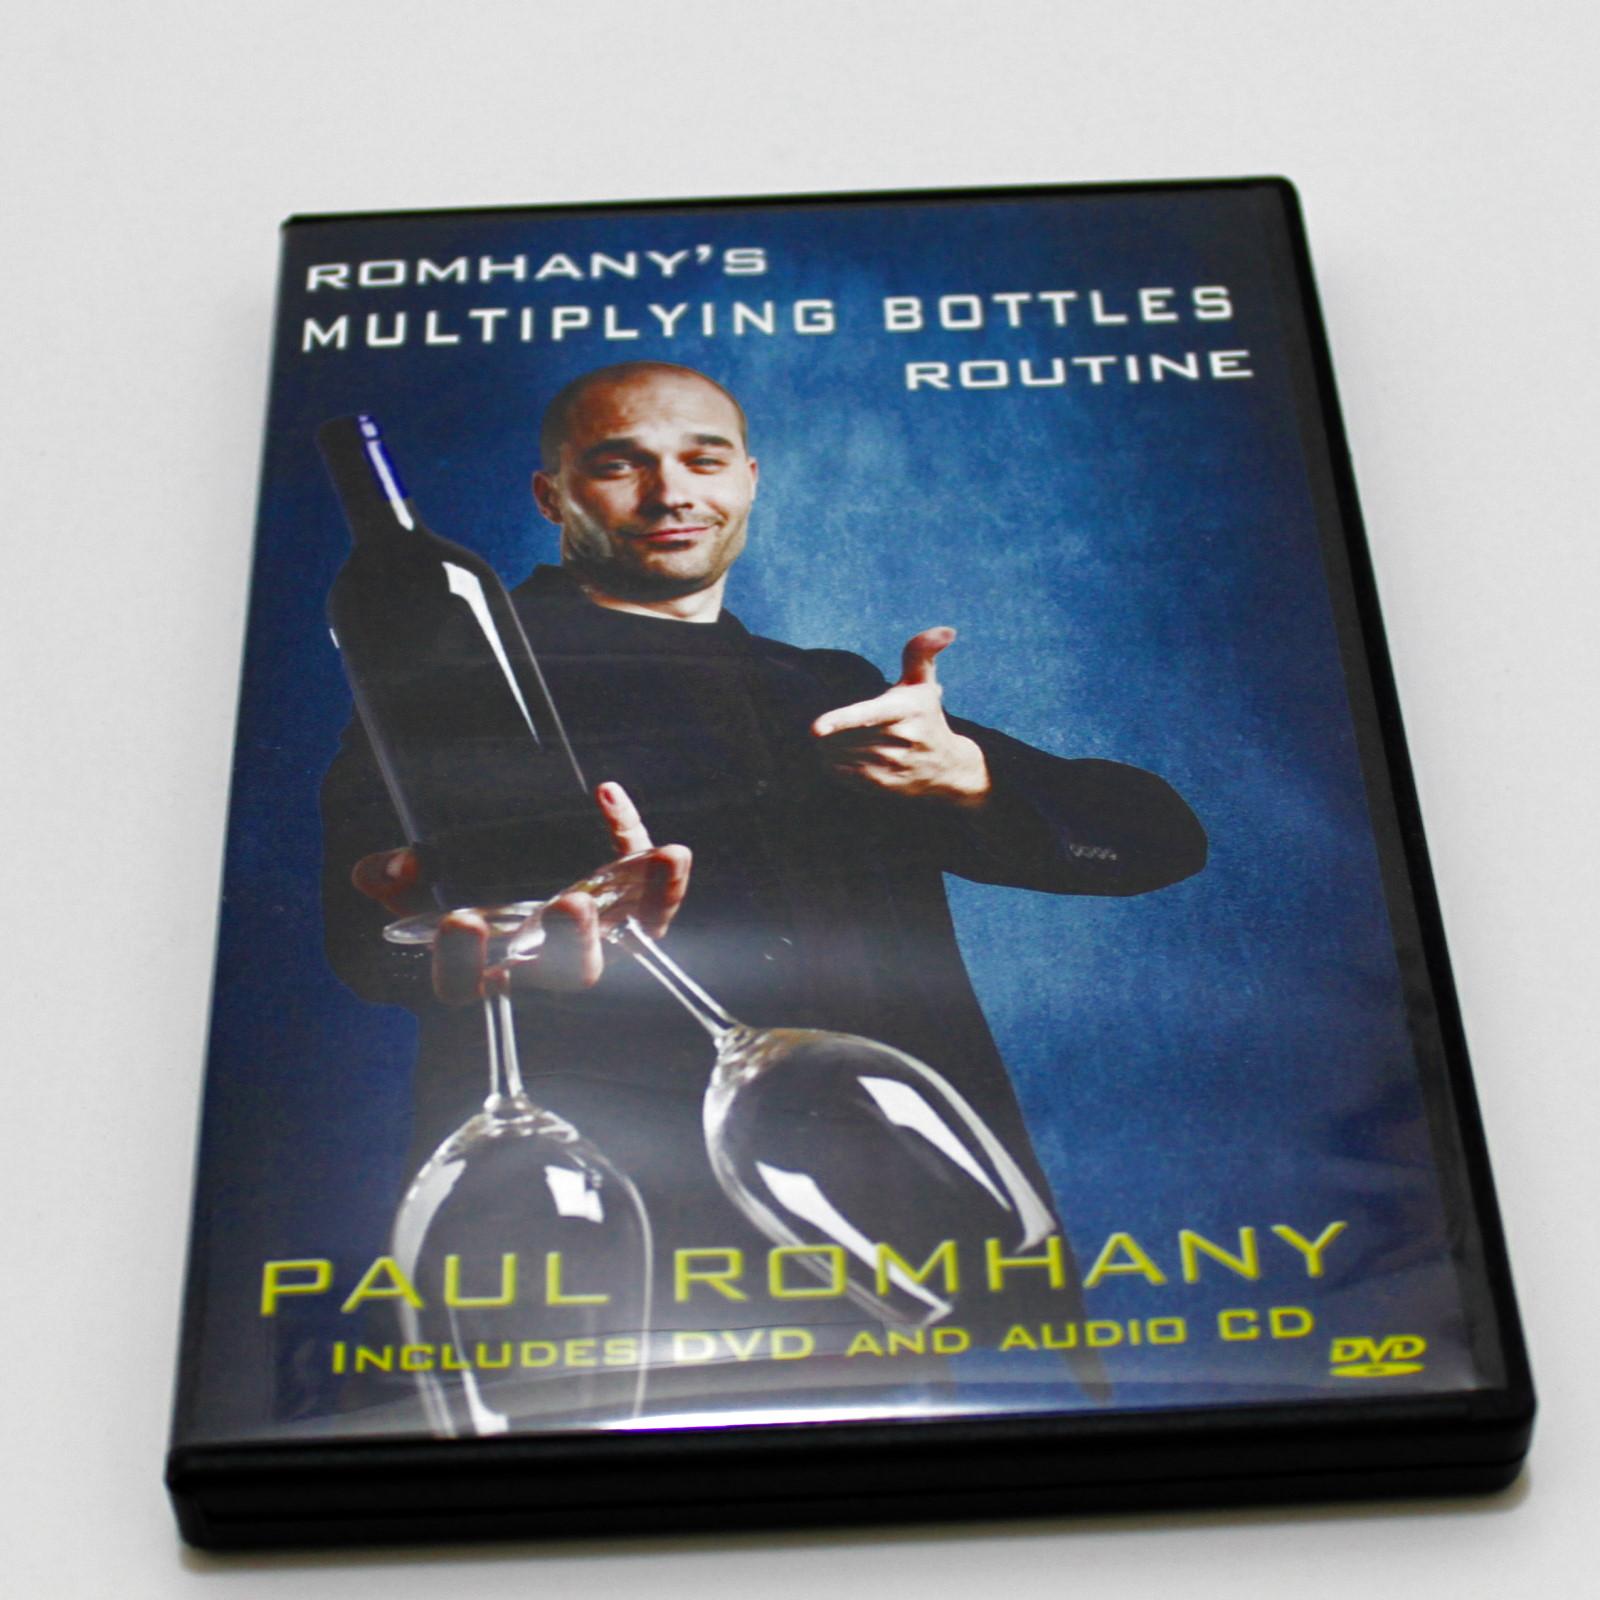 Romhany's Multiplying Bottles Routine by Paul Romhany